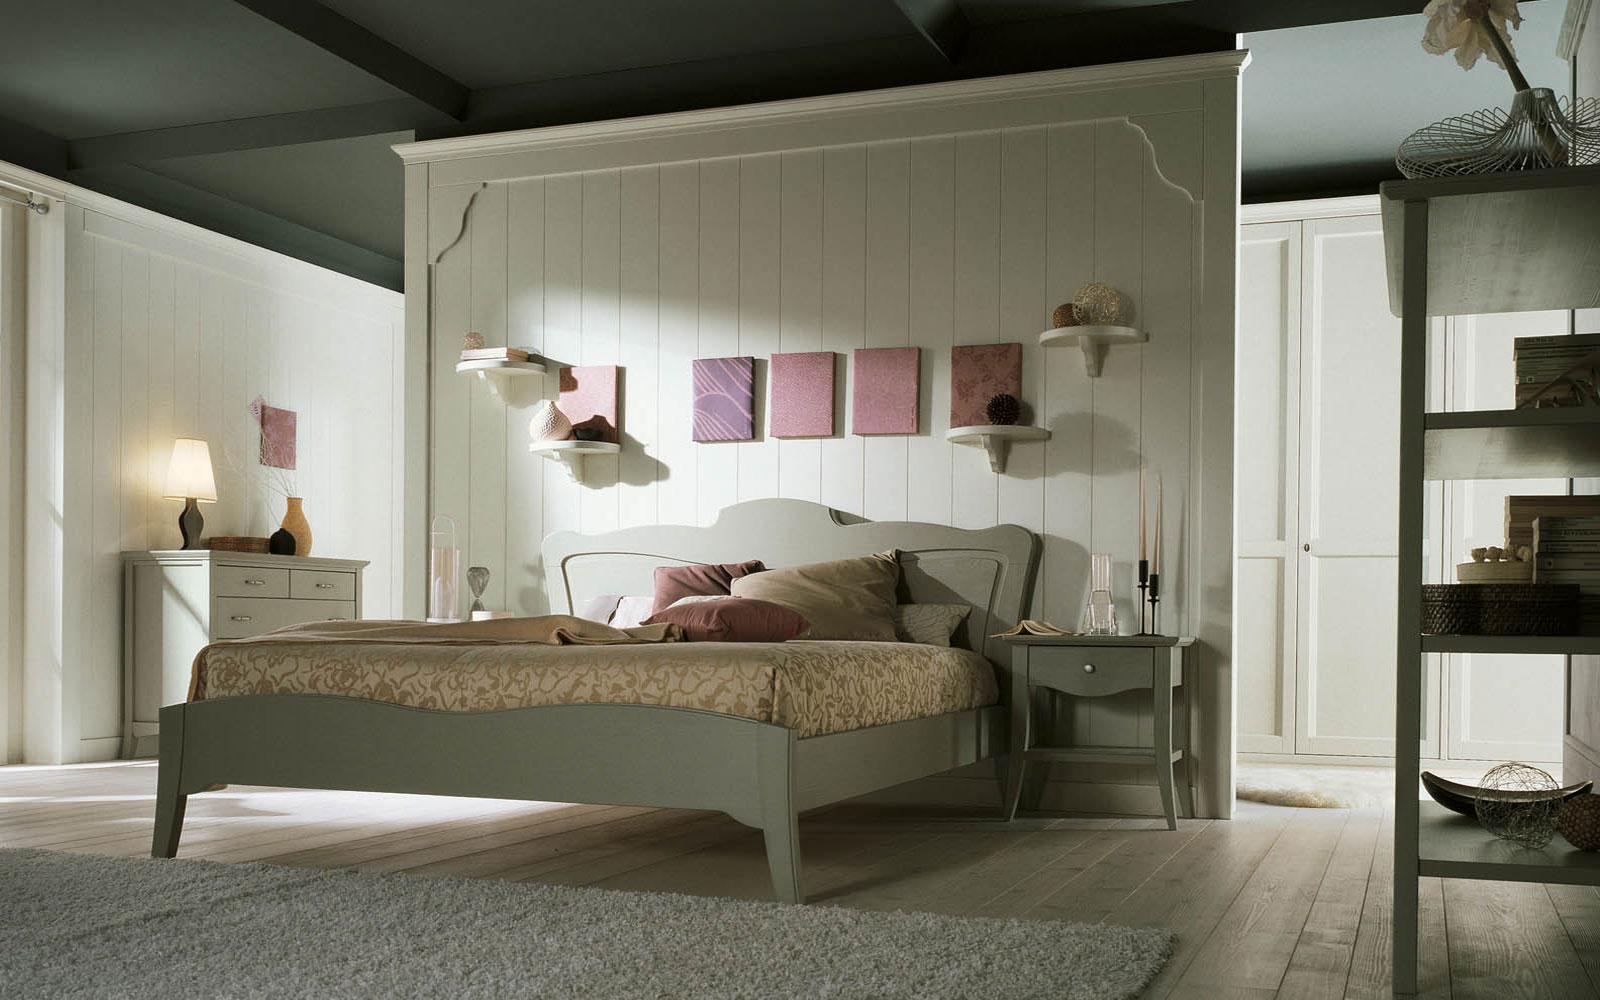 Stunning Scandola Mobili Prezzi Pictures - Home Design Ideas 2017 ...